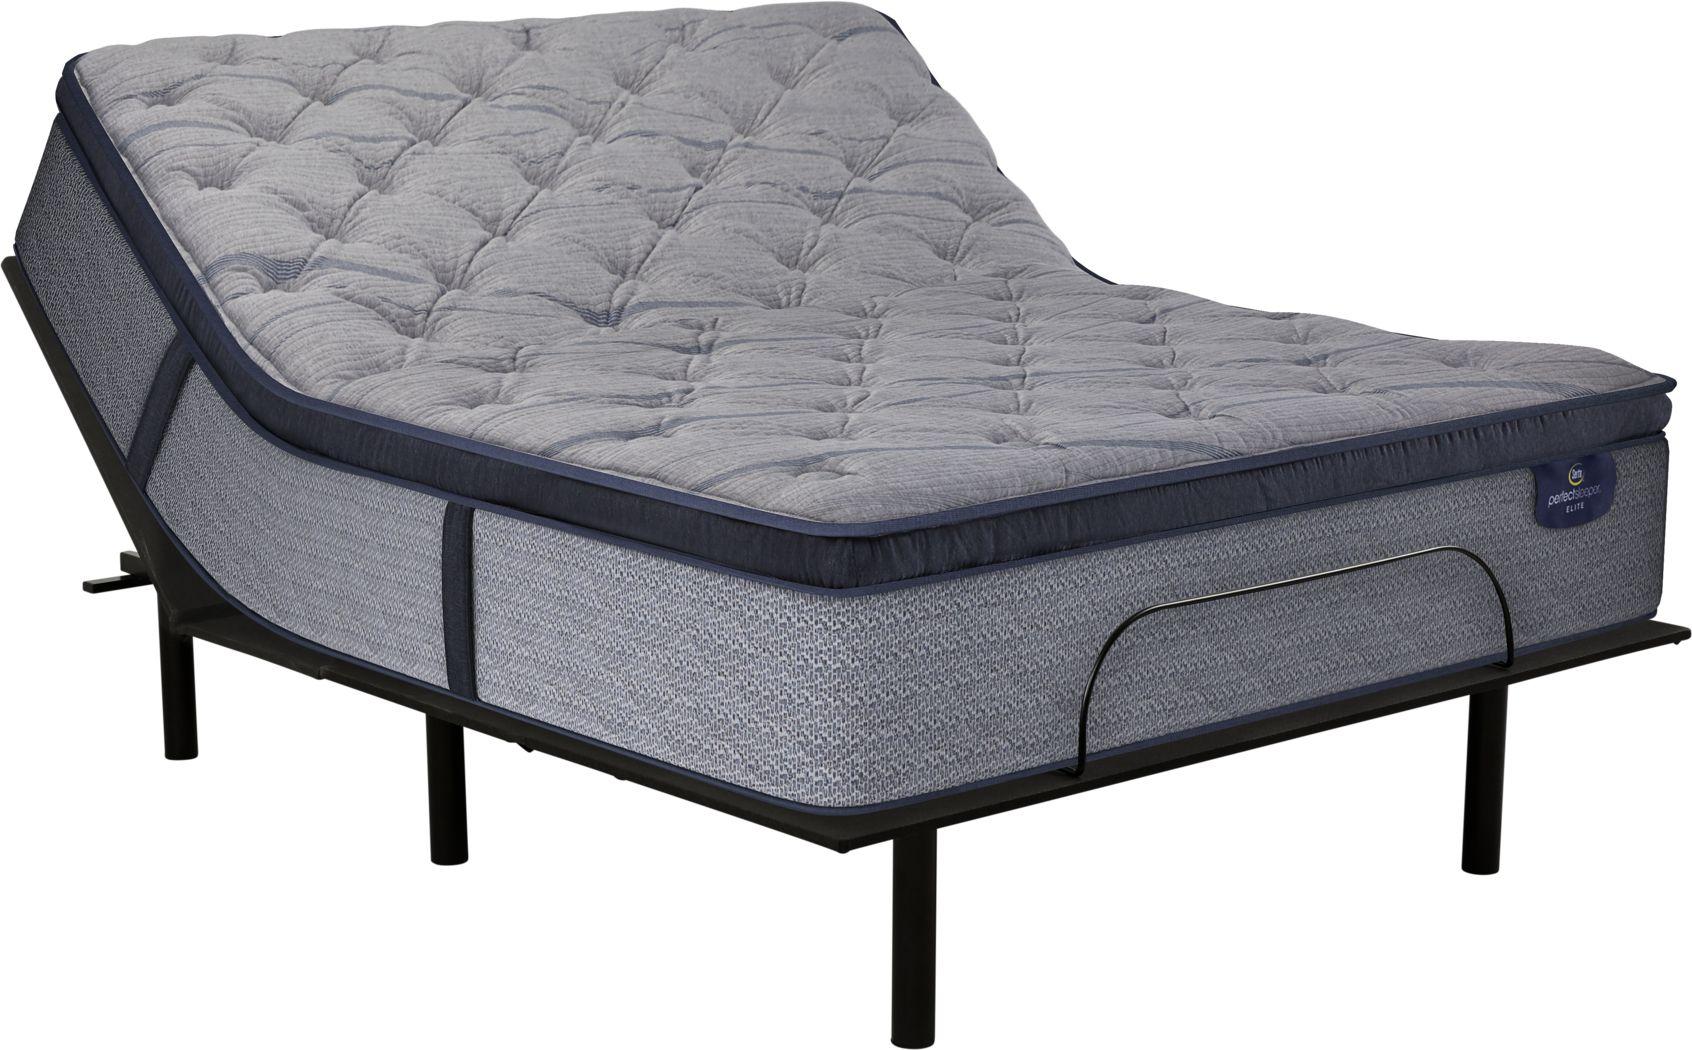 Serta Perfect Sleeper Pine Meadow Queen Mattress with RTG Sleep 2000 Adjustable Base